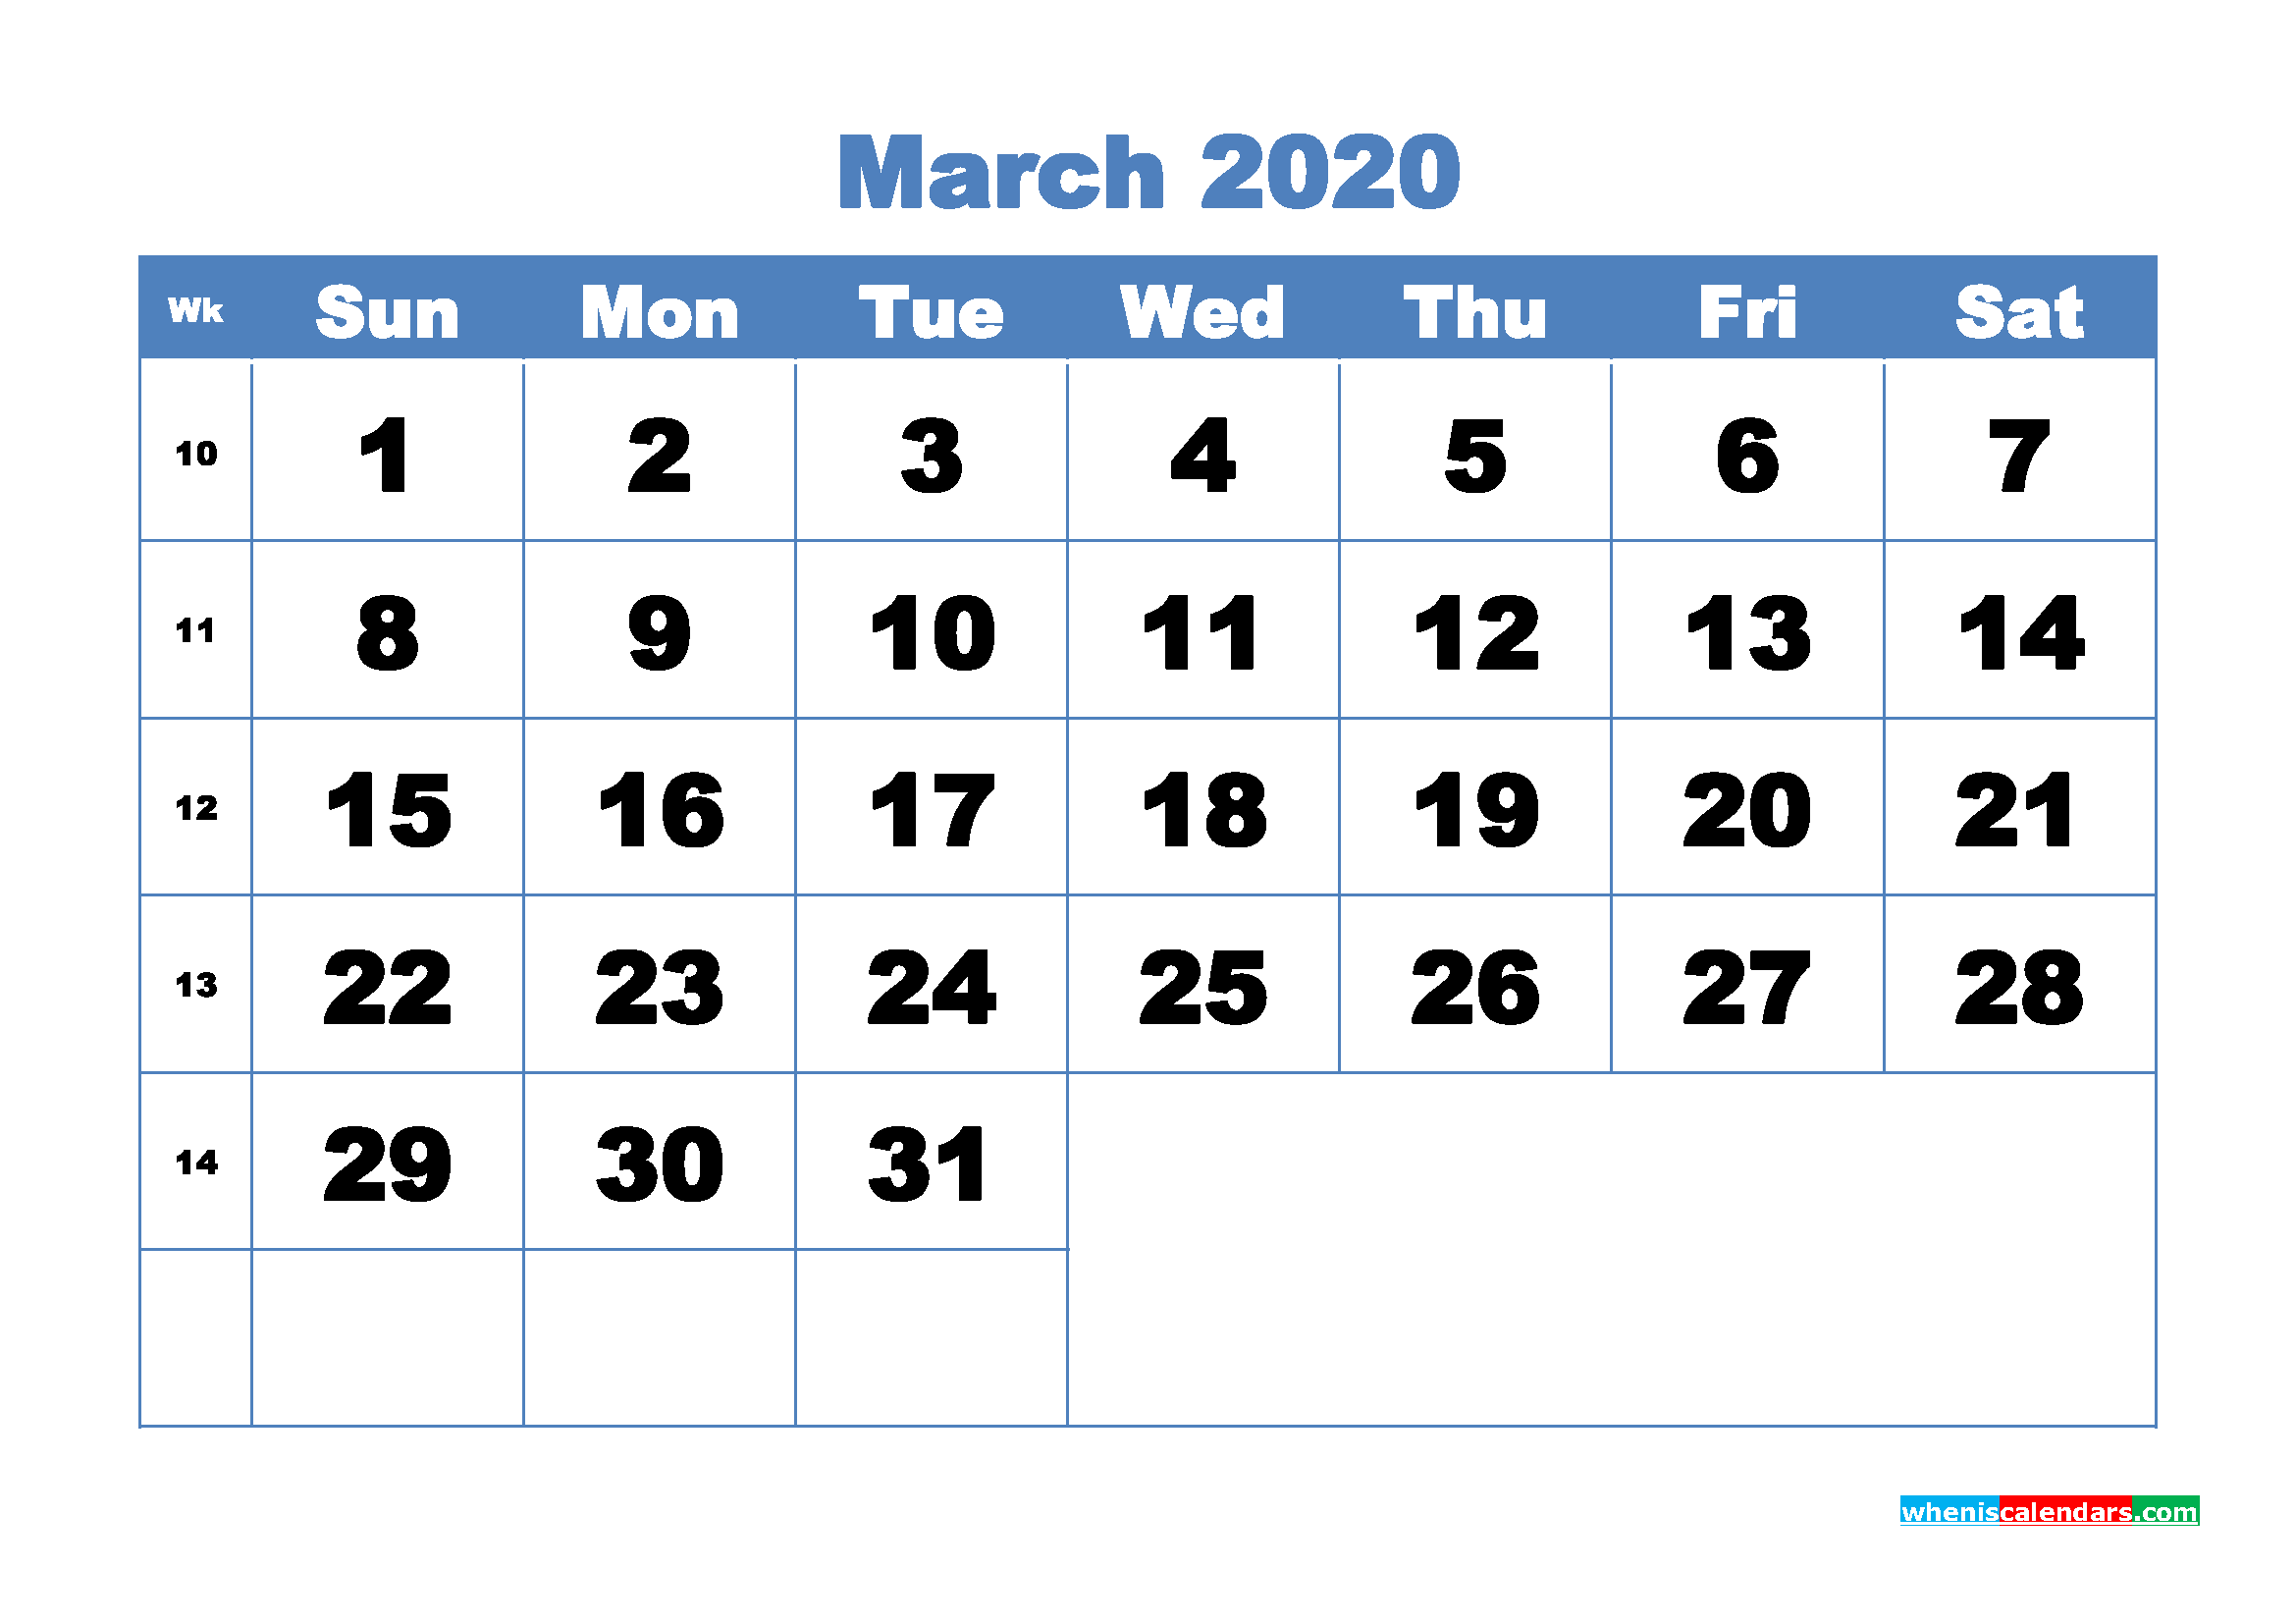 March Printable Calendar 2020 PDF, Word - No.m20b303